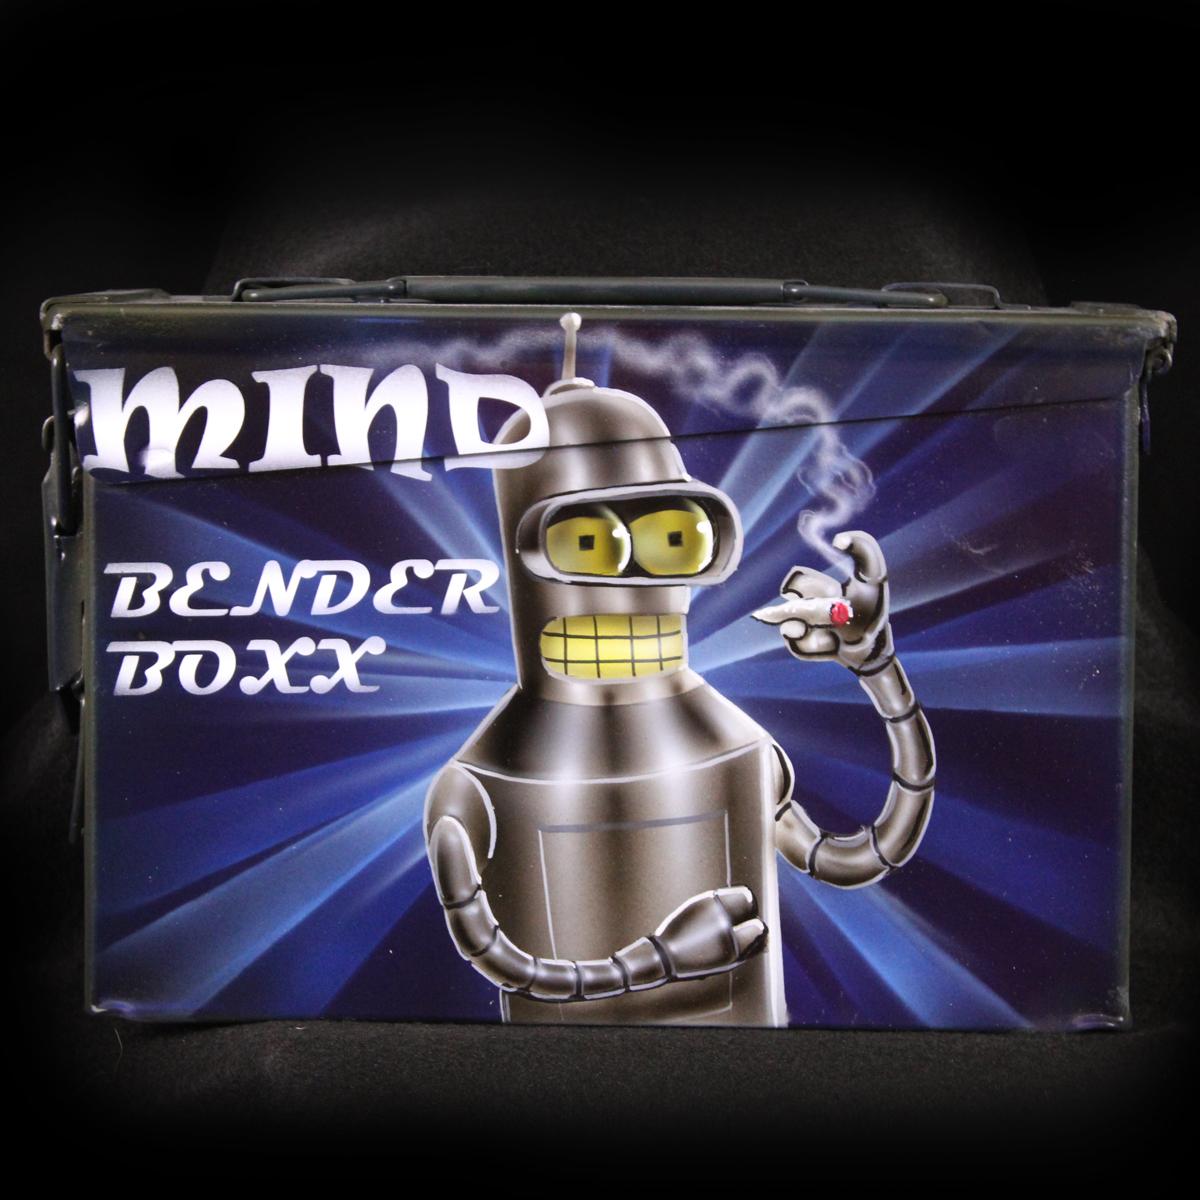 Bender Boxx